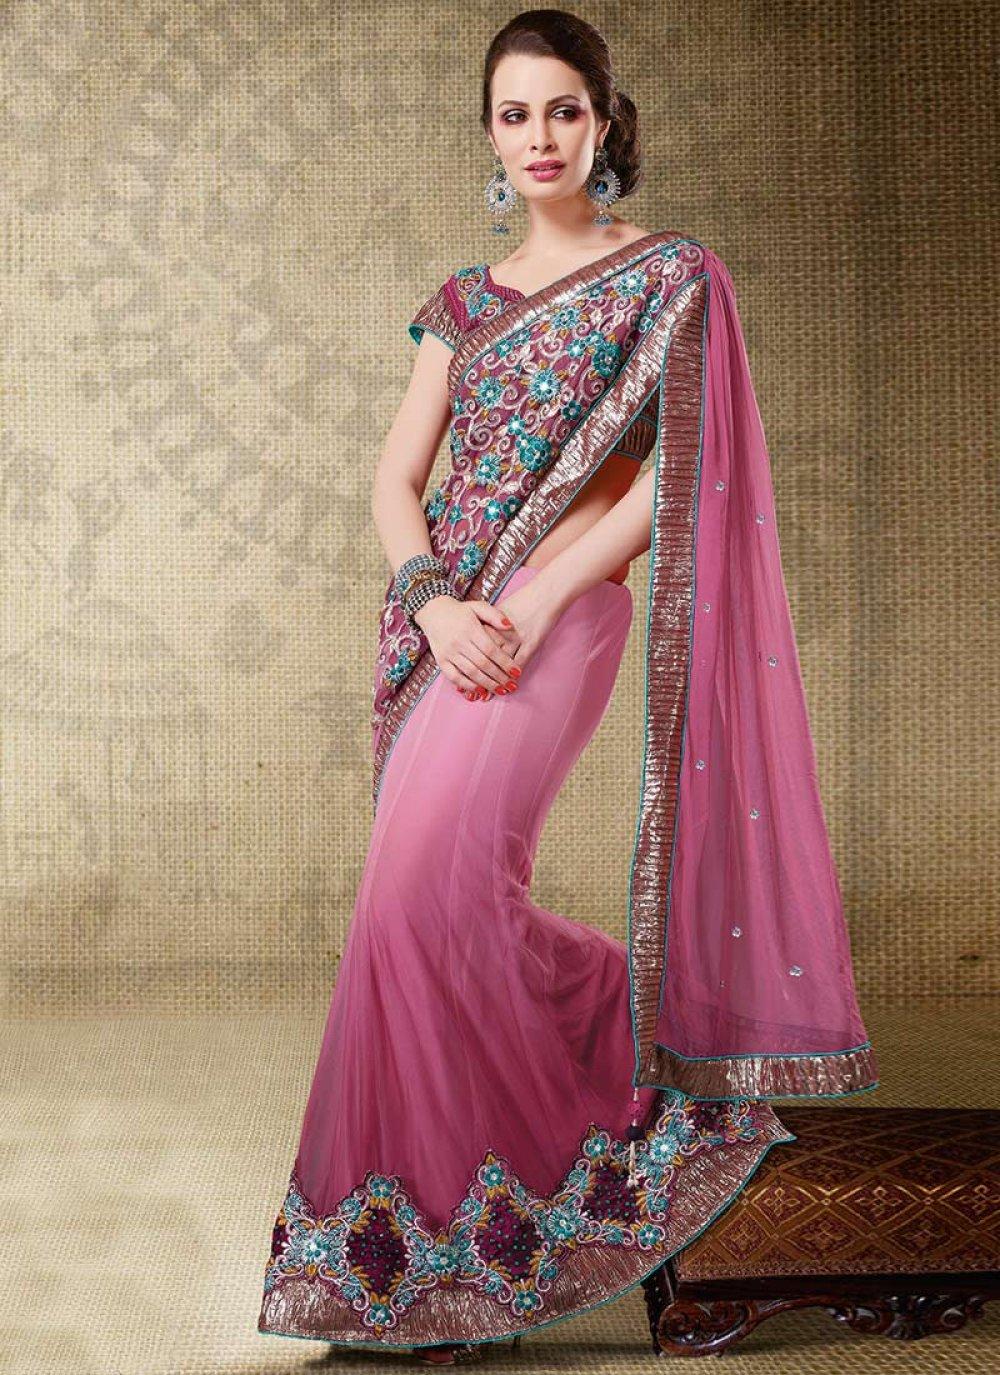 Shaded Pinkish Mauve Lehenga Style Saree